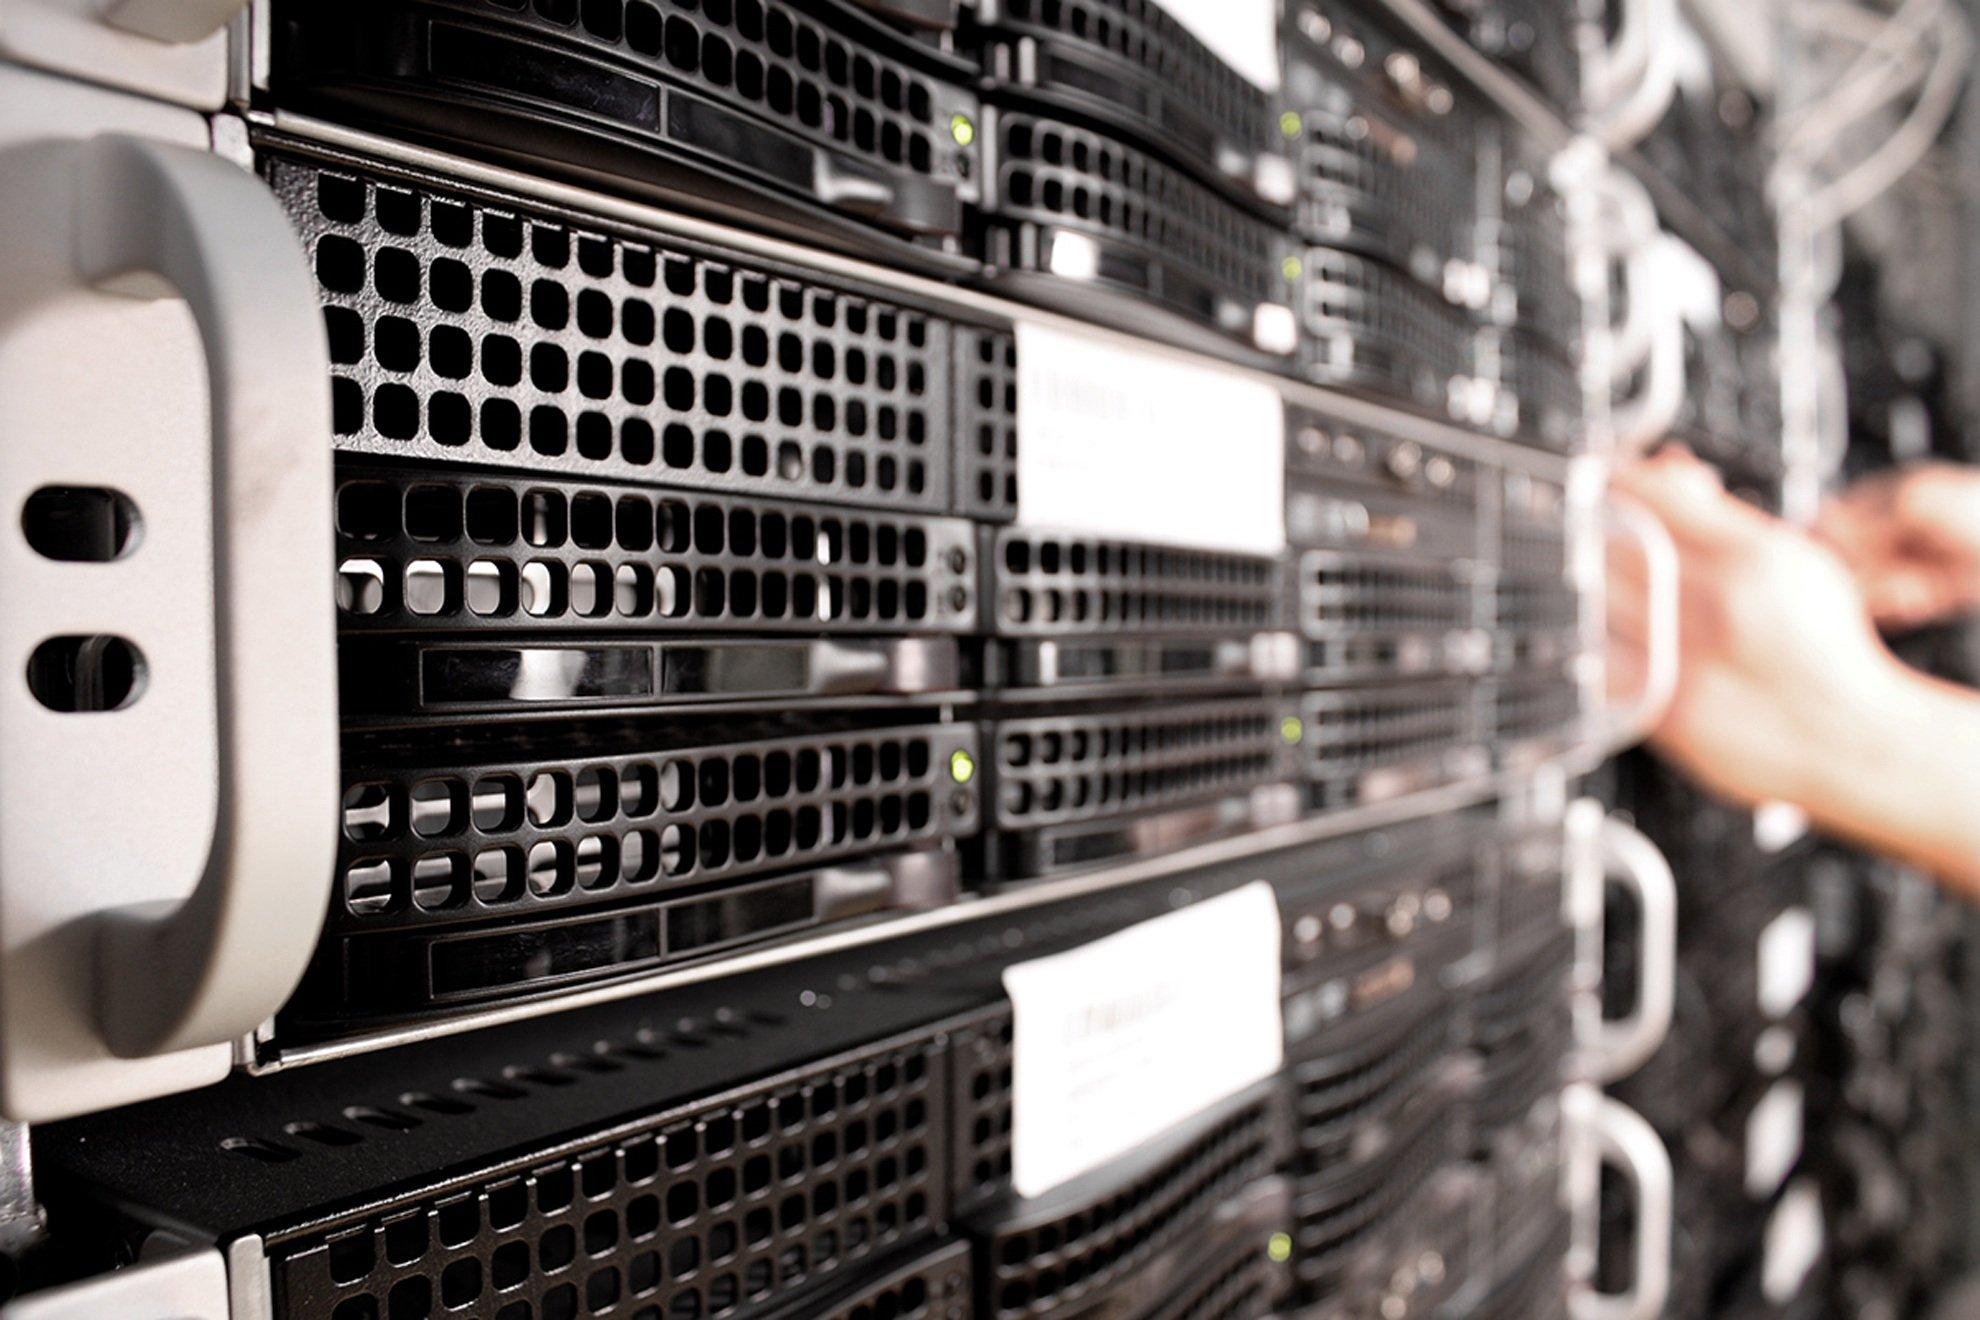 Canva - Database Server Technology